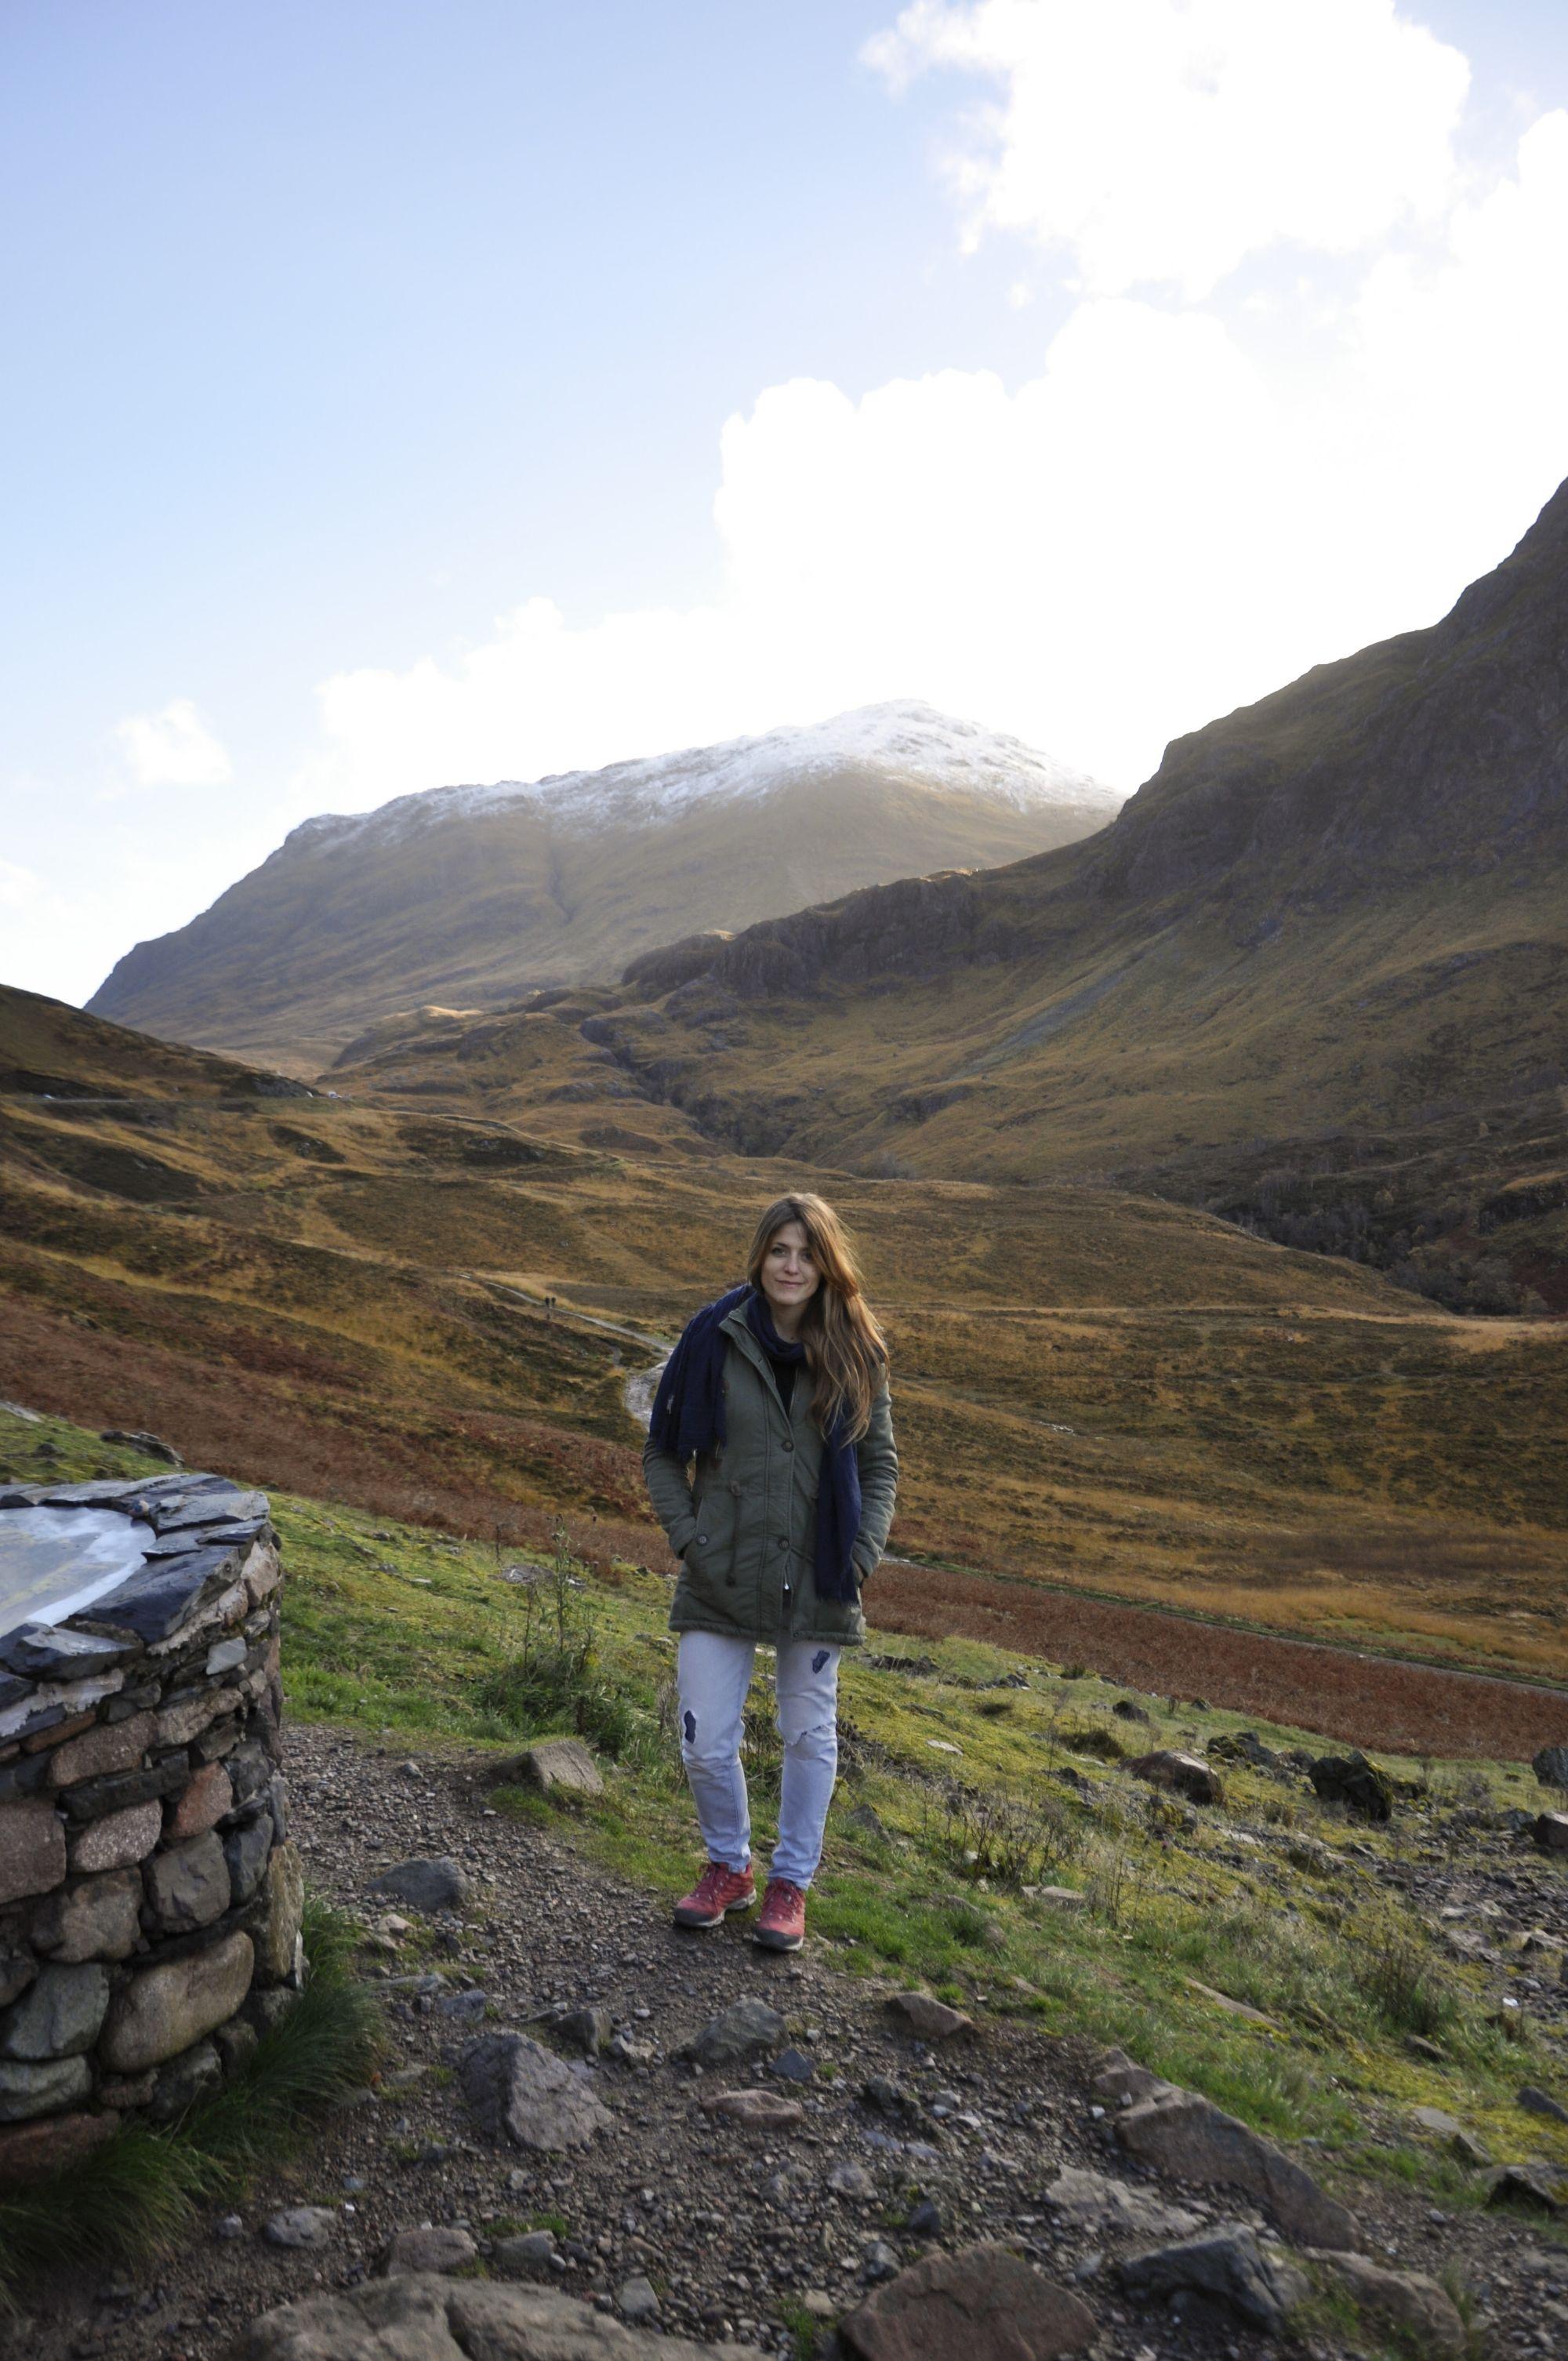 Me (Simona) and the Highlands